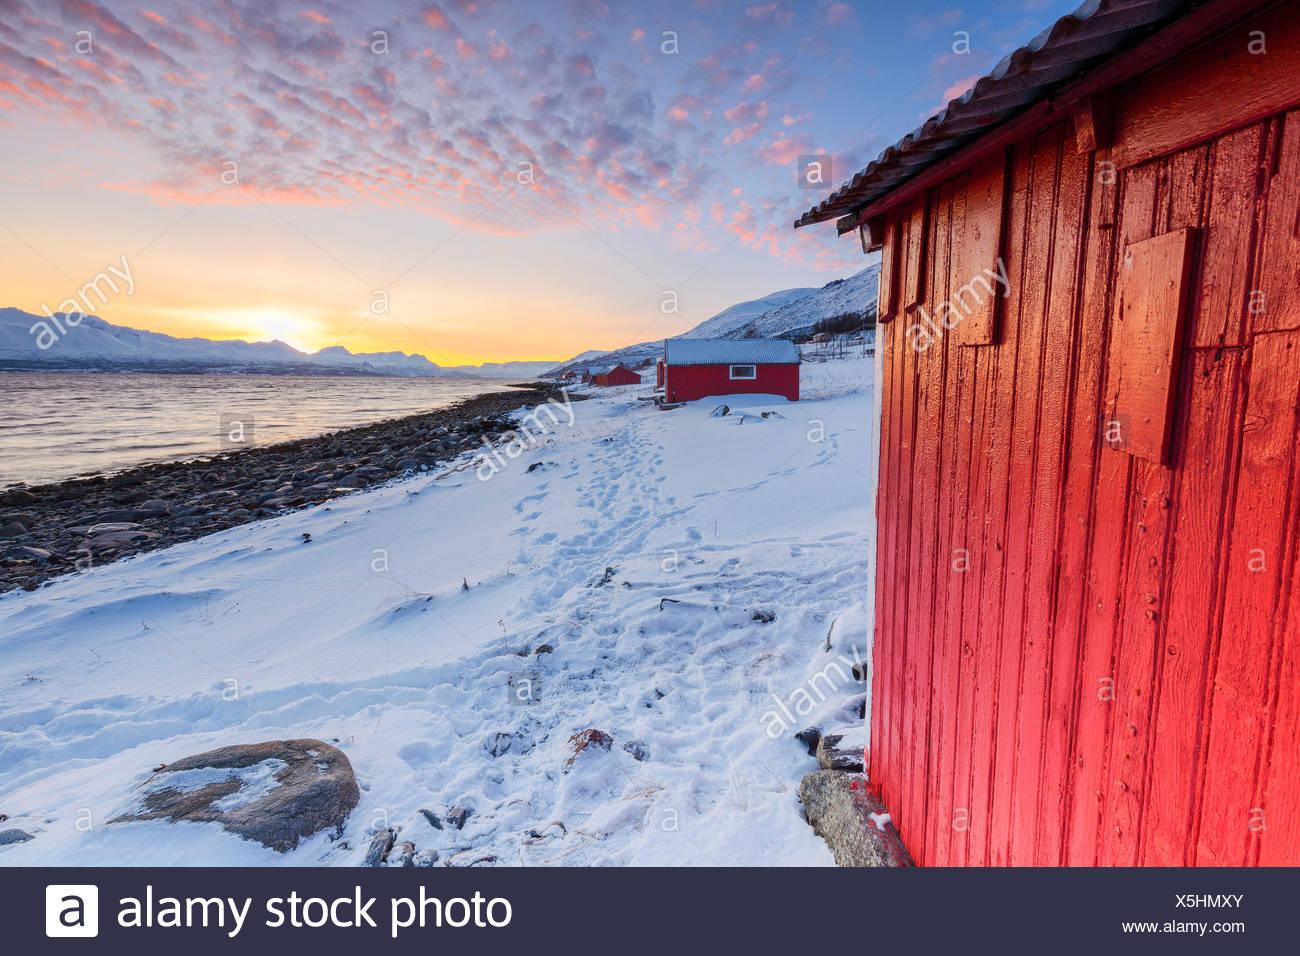 Sunset among the fishermen's houses overlooking the fjord. Nordmannvik, Kafjord, Lyngen Alps, Troms, Norway, Lapland, Europe. Stock Photo